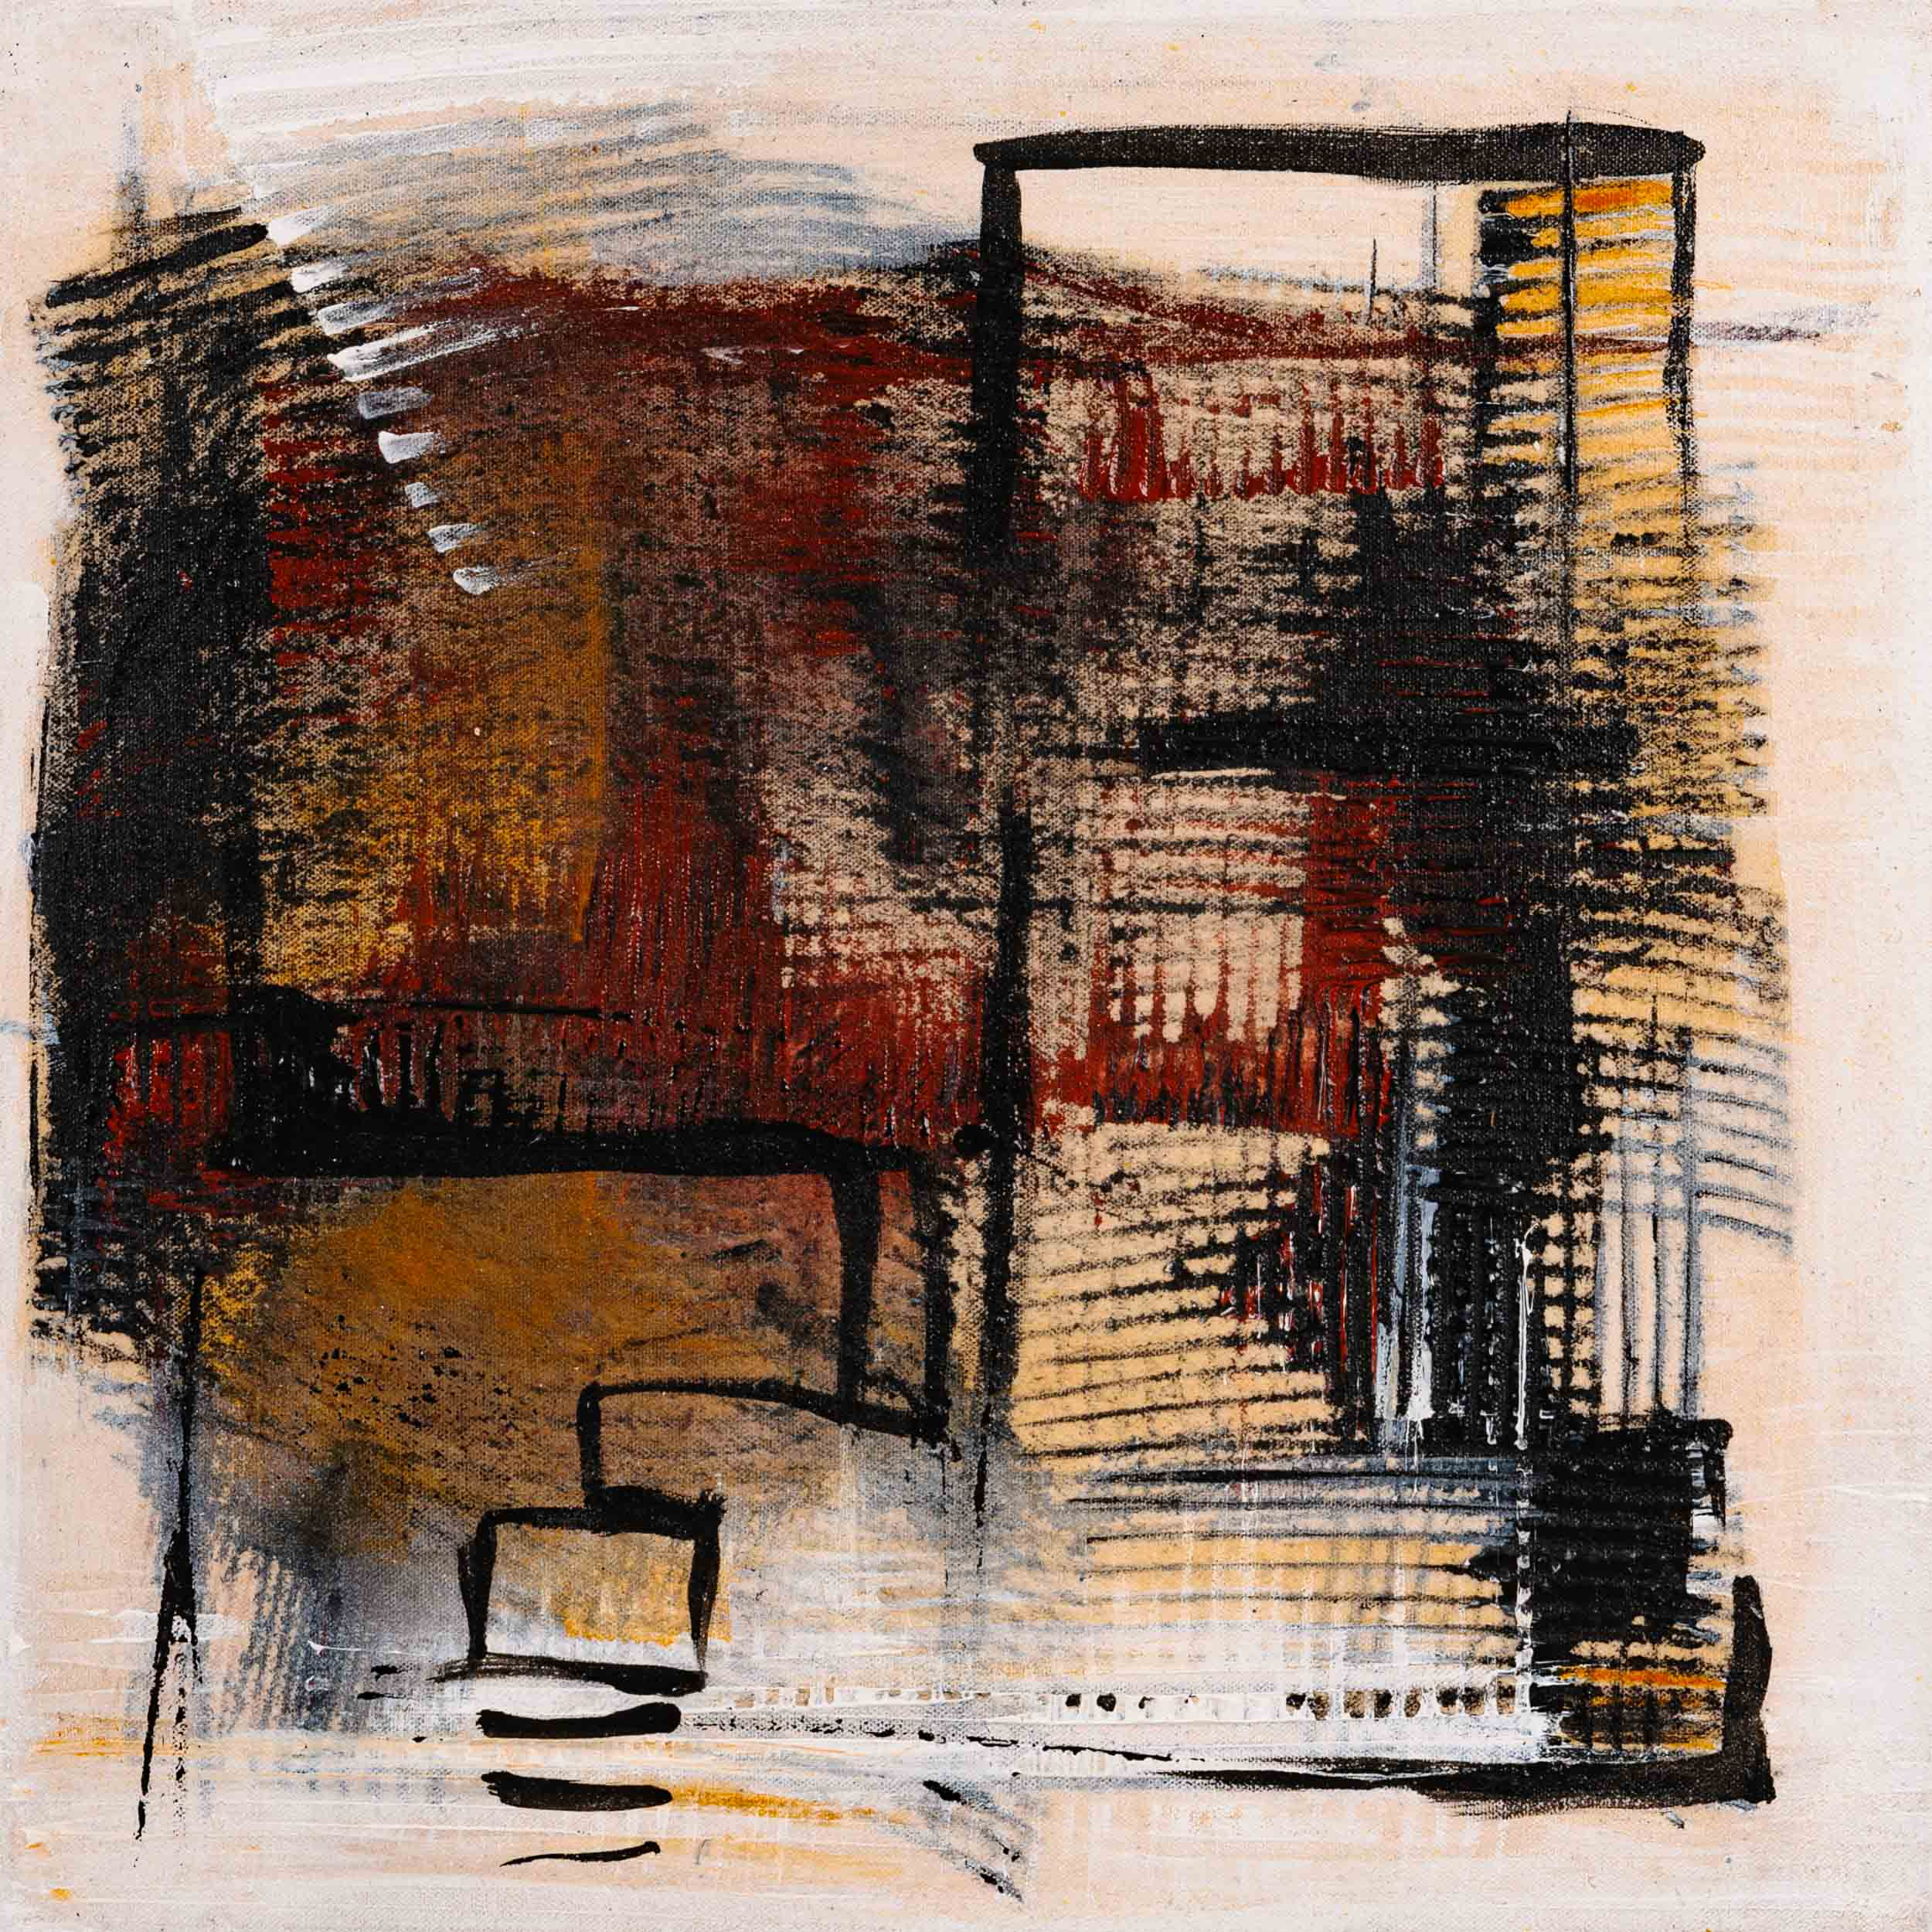 Intervalles | Composition 399 B